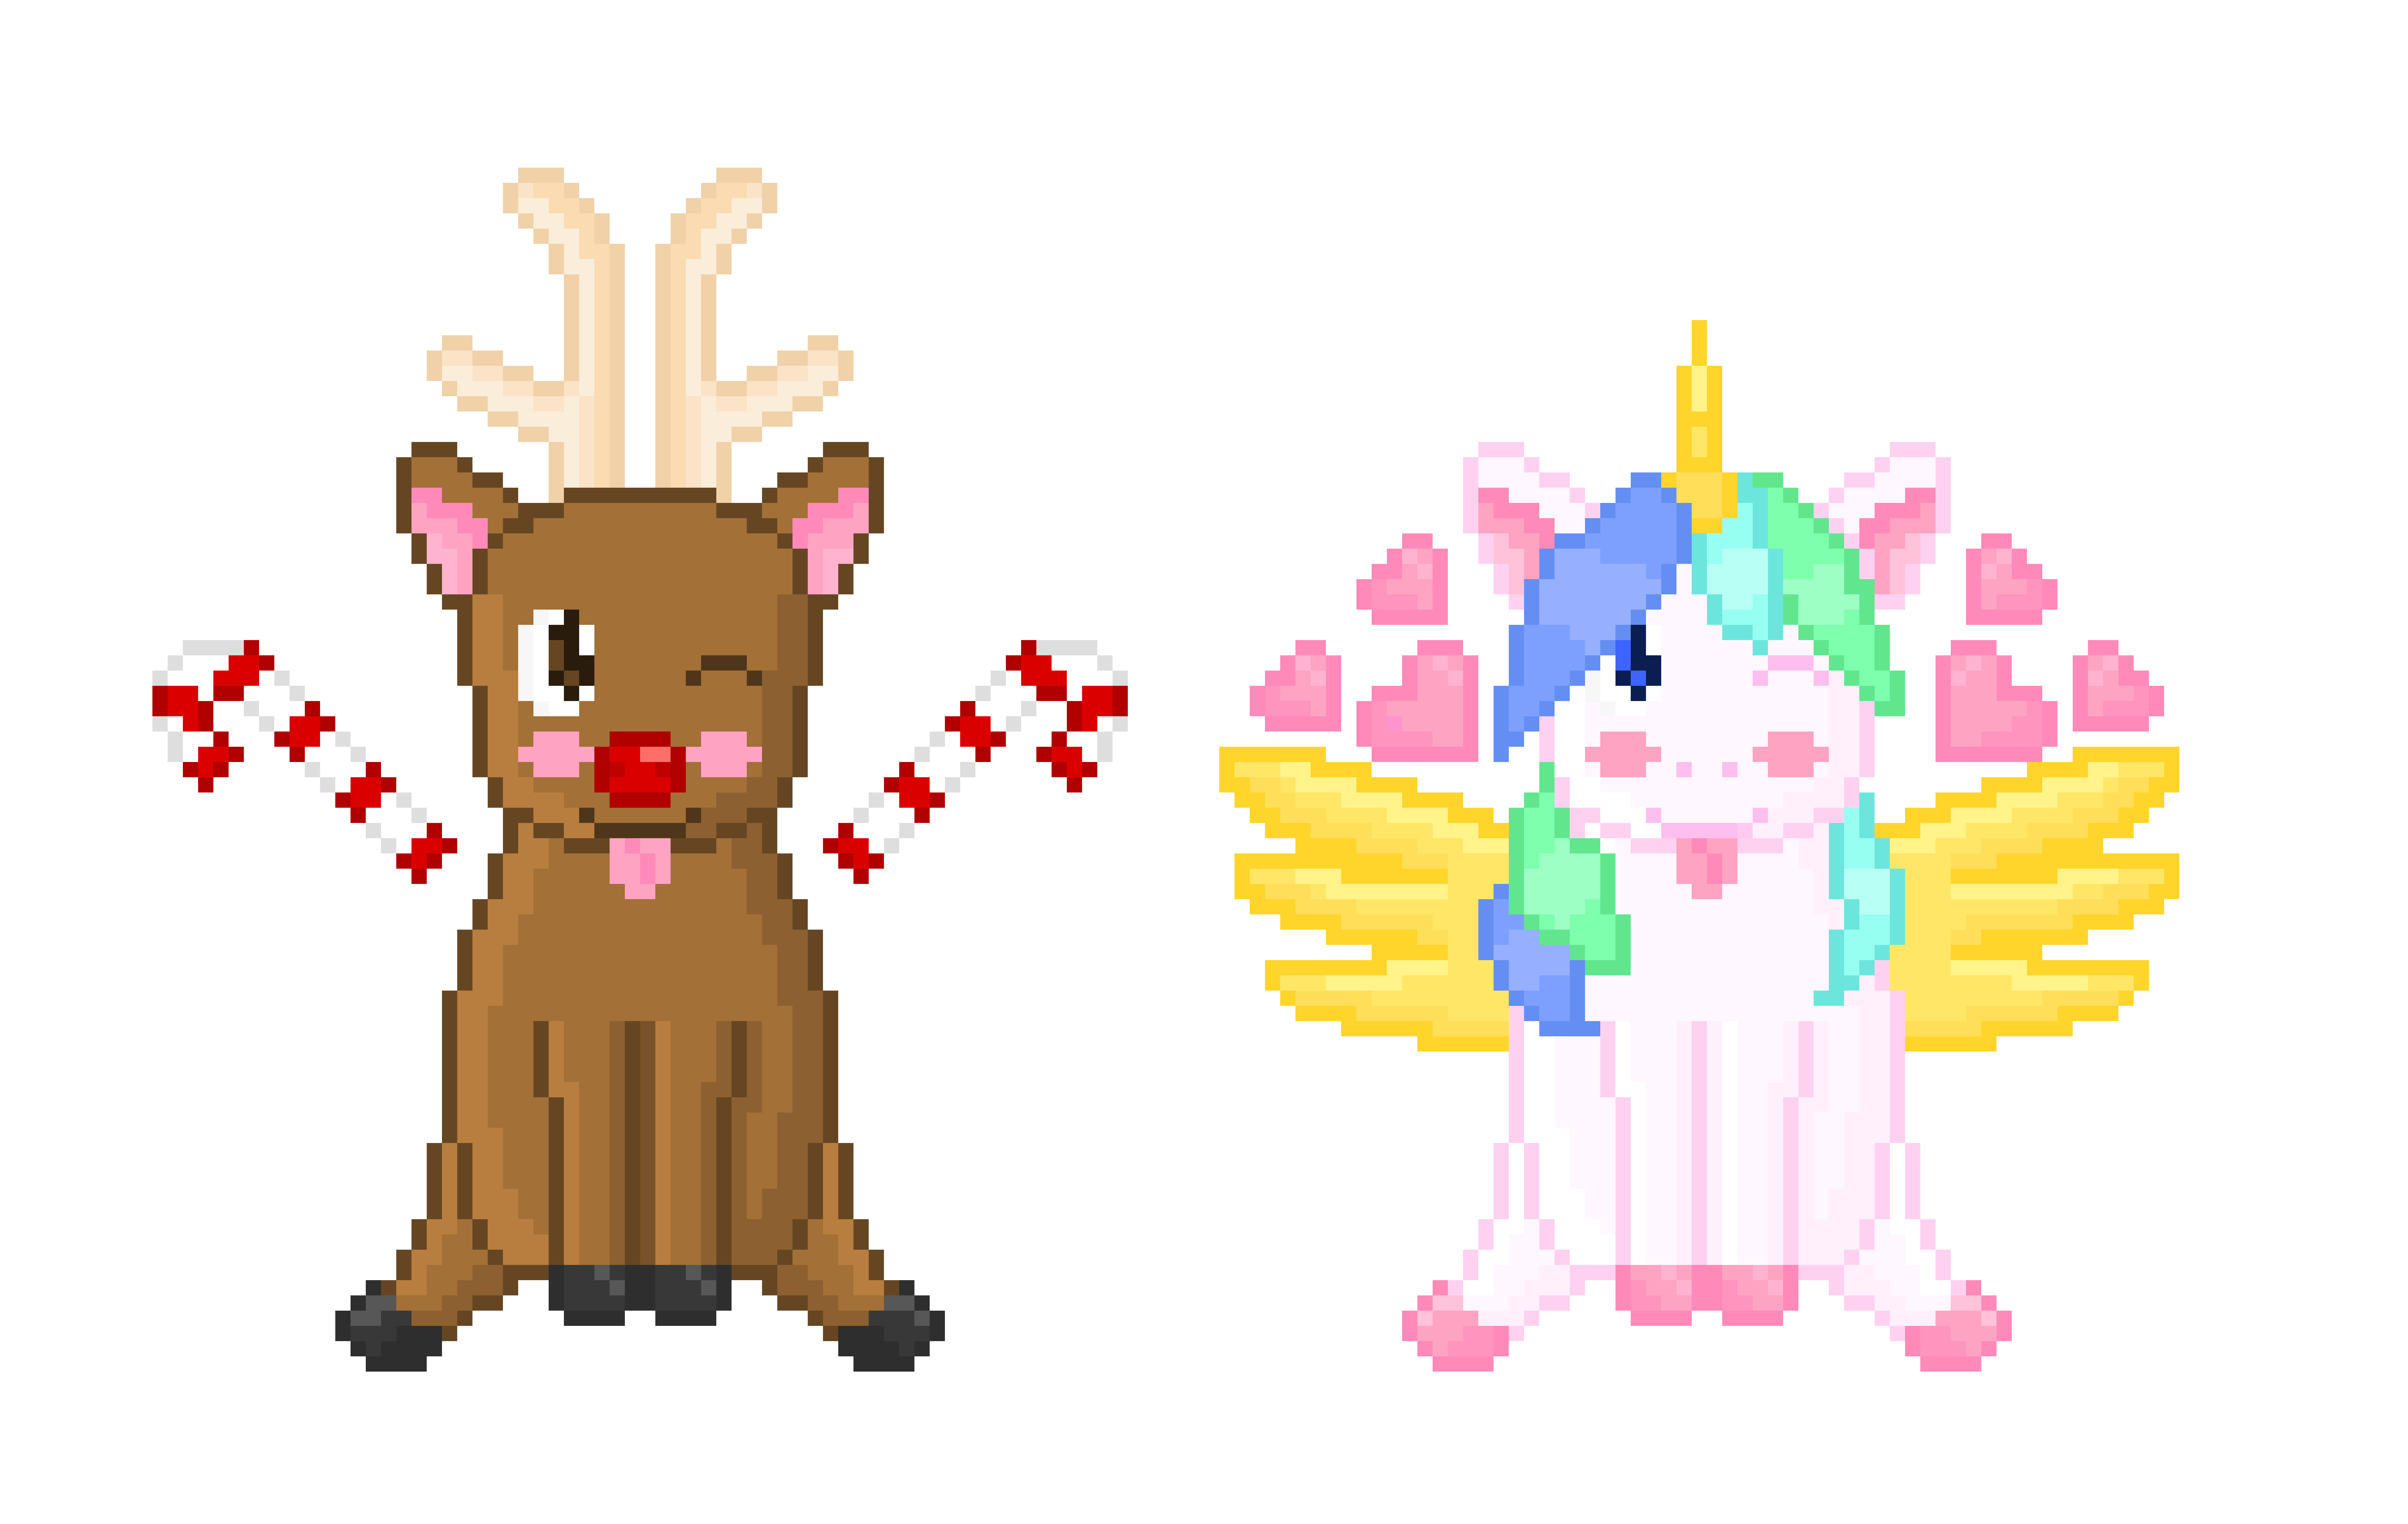 Clipart reindeer kawaii. And unicorn pixel art